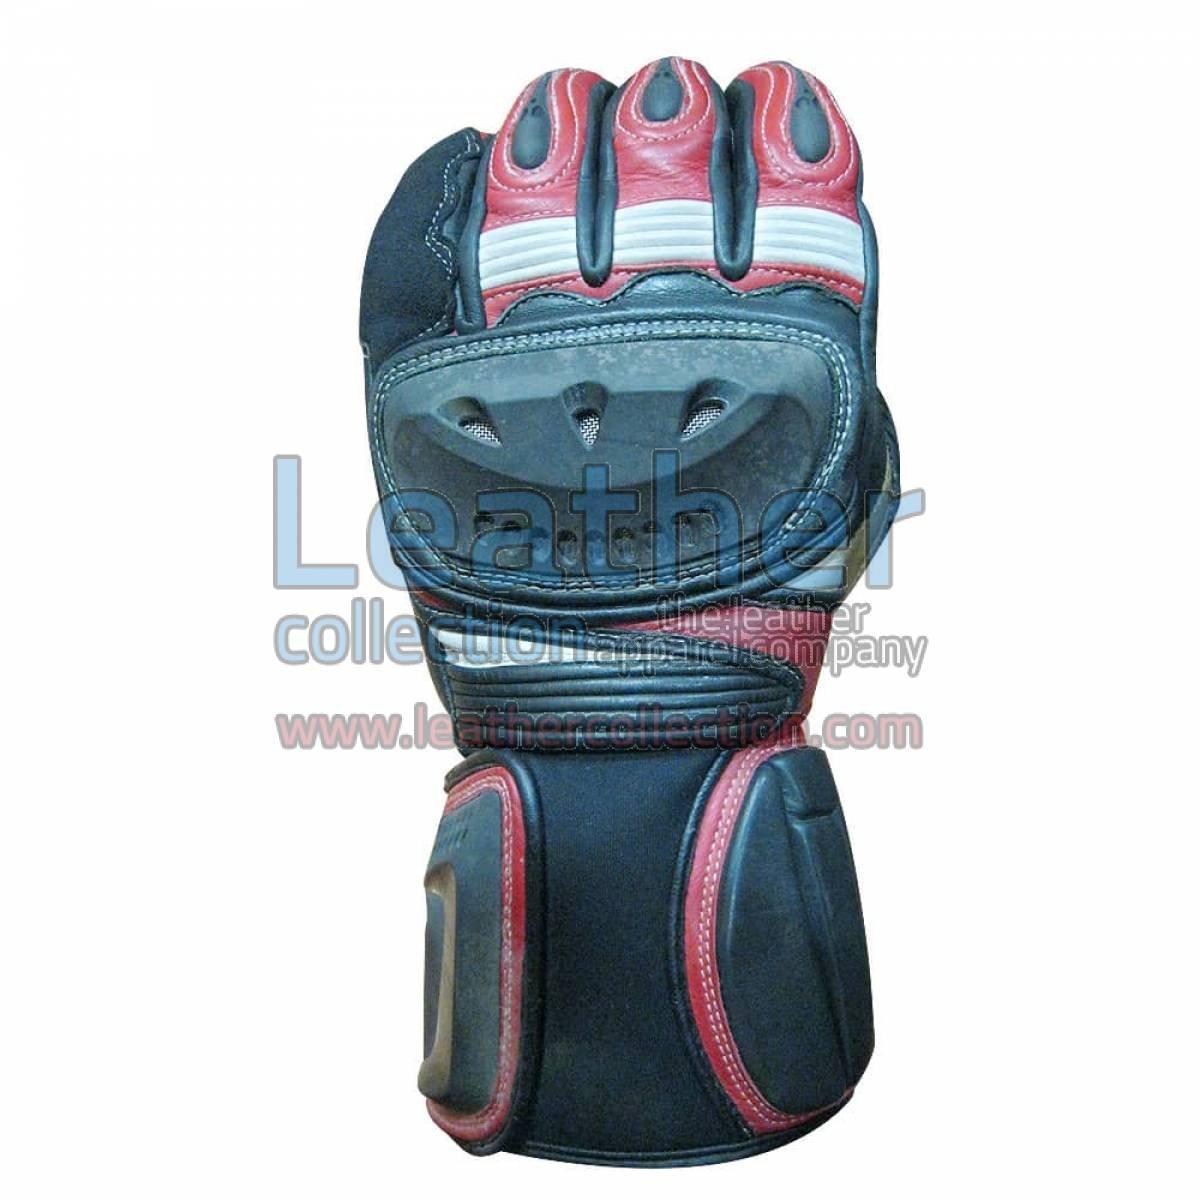 Shadow Motorbike Leather Gloves